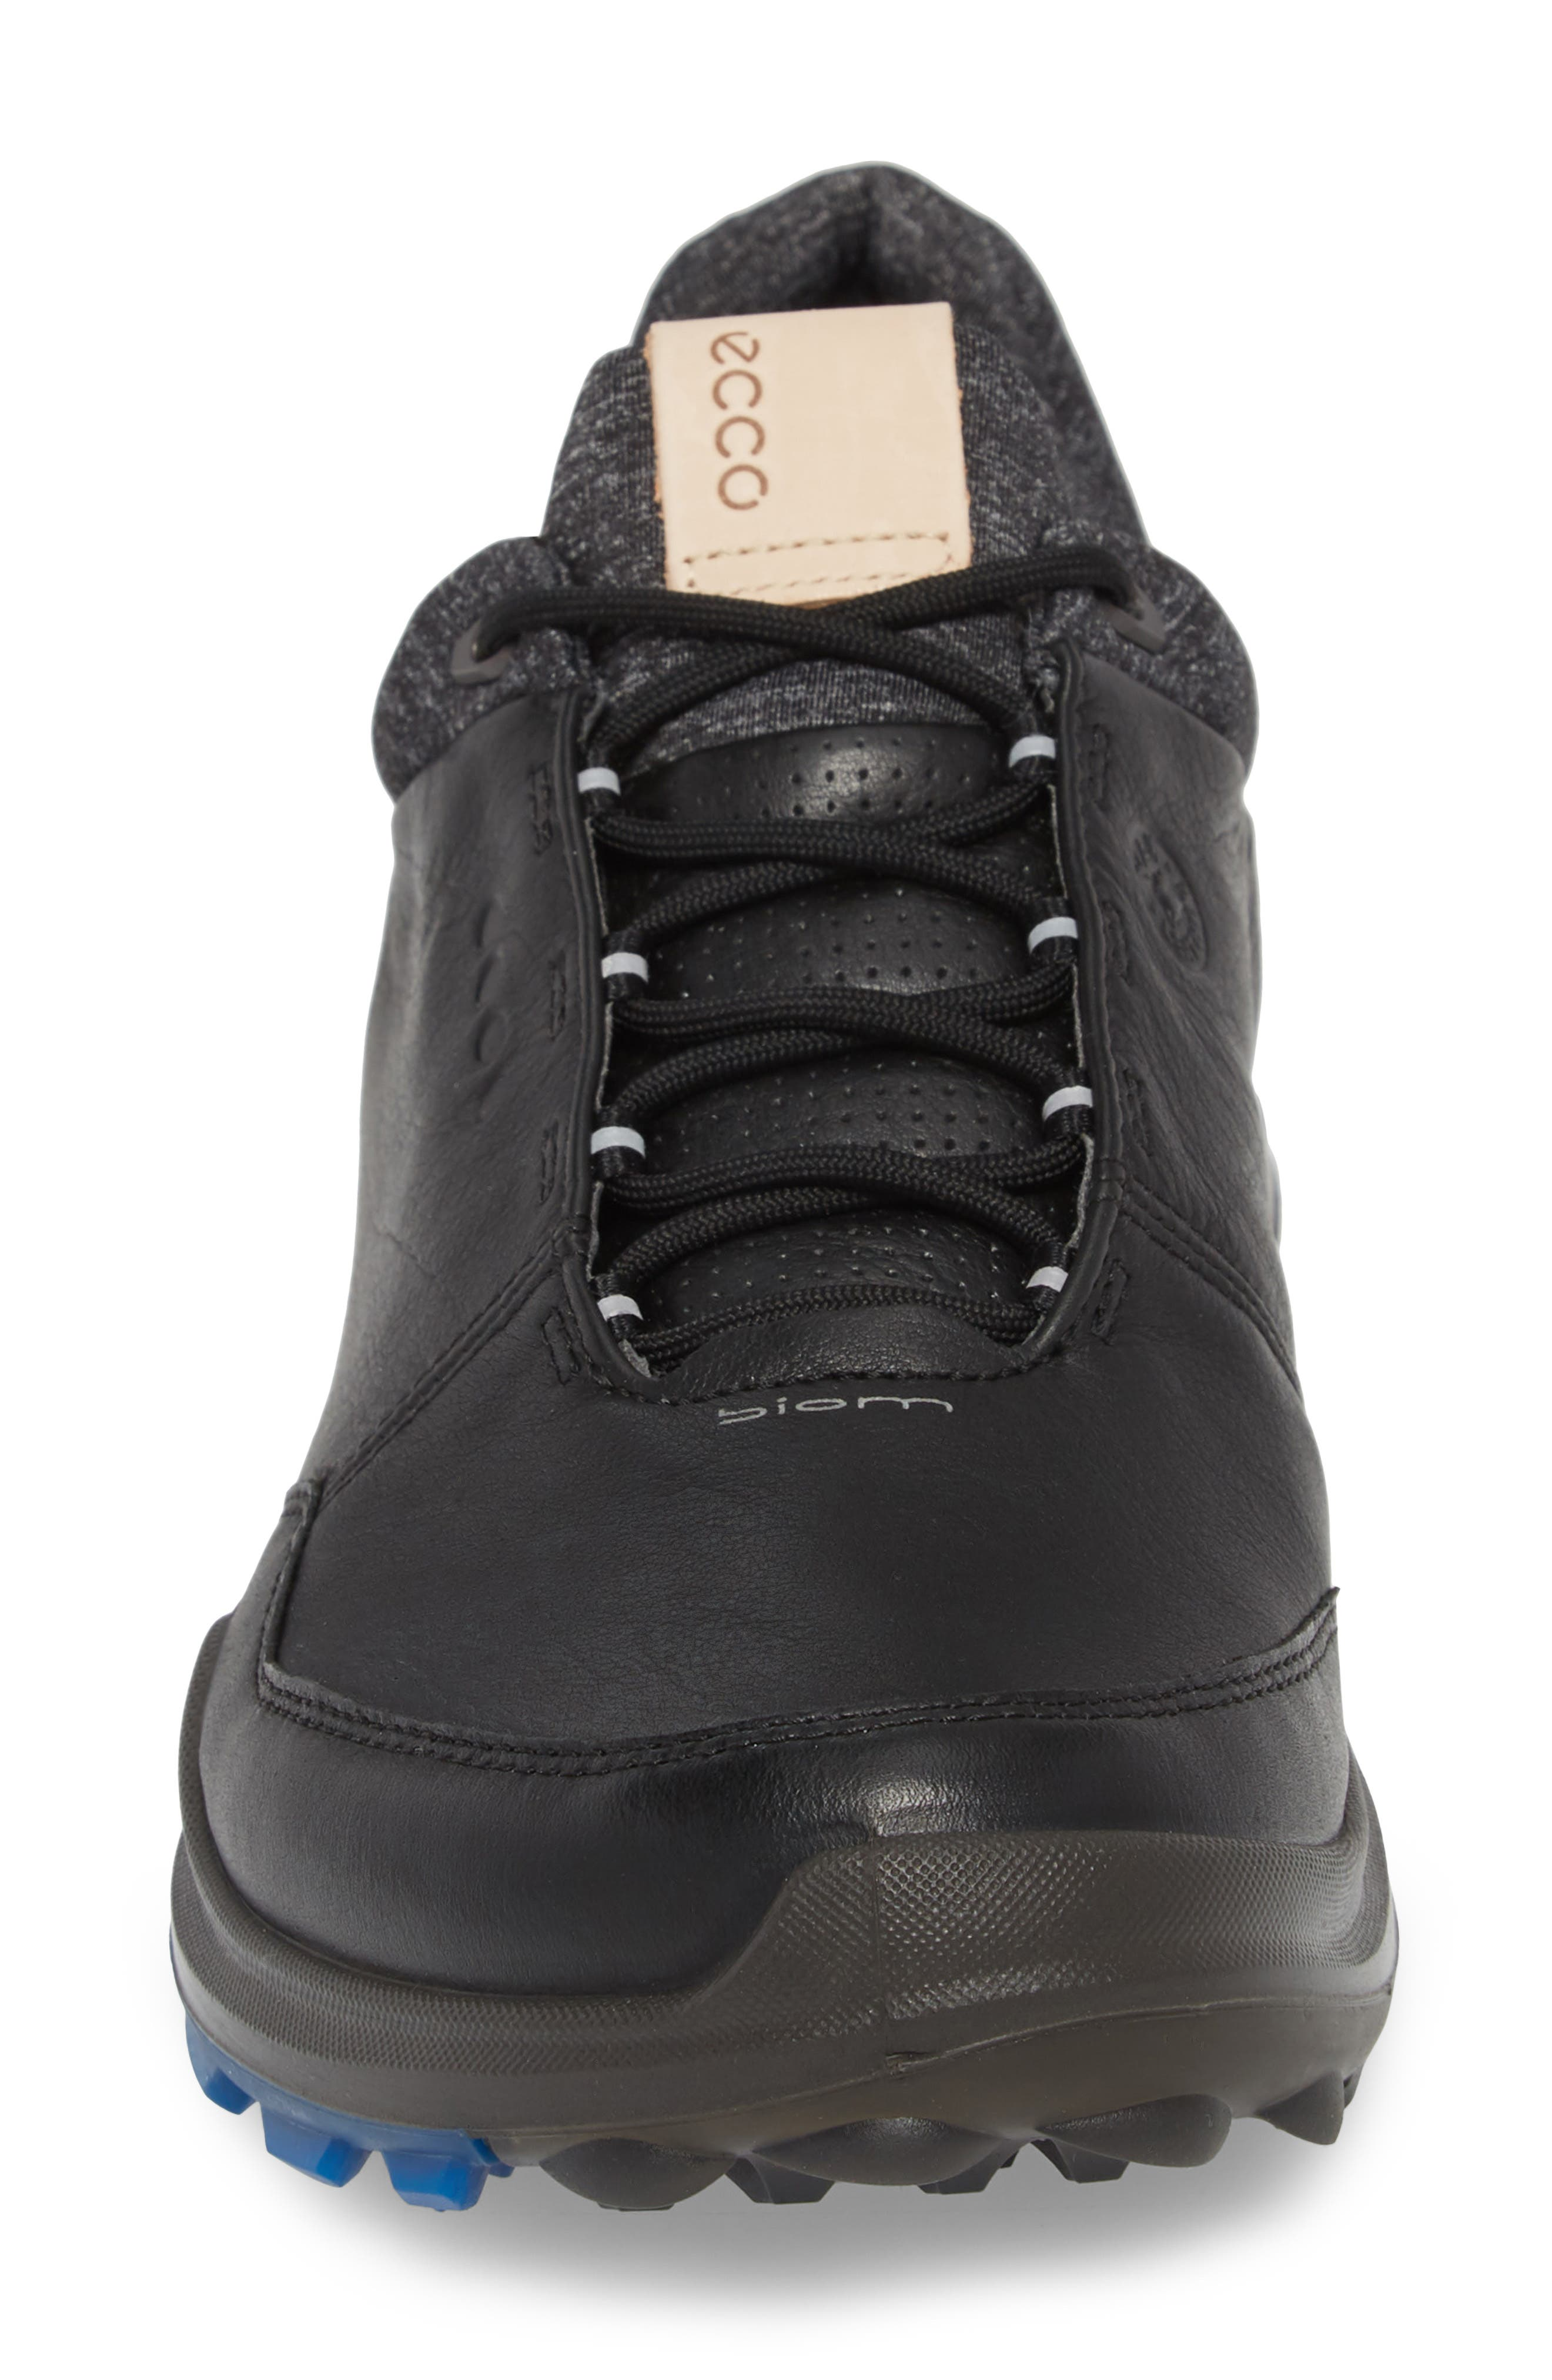 BIOM Hybrid 3 Gore-Tex<sup>®</sup> Golf Shoe,                             Alternate thumbnail 4, color,                             Black/ Bermuda Blue Leather